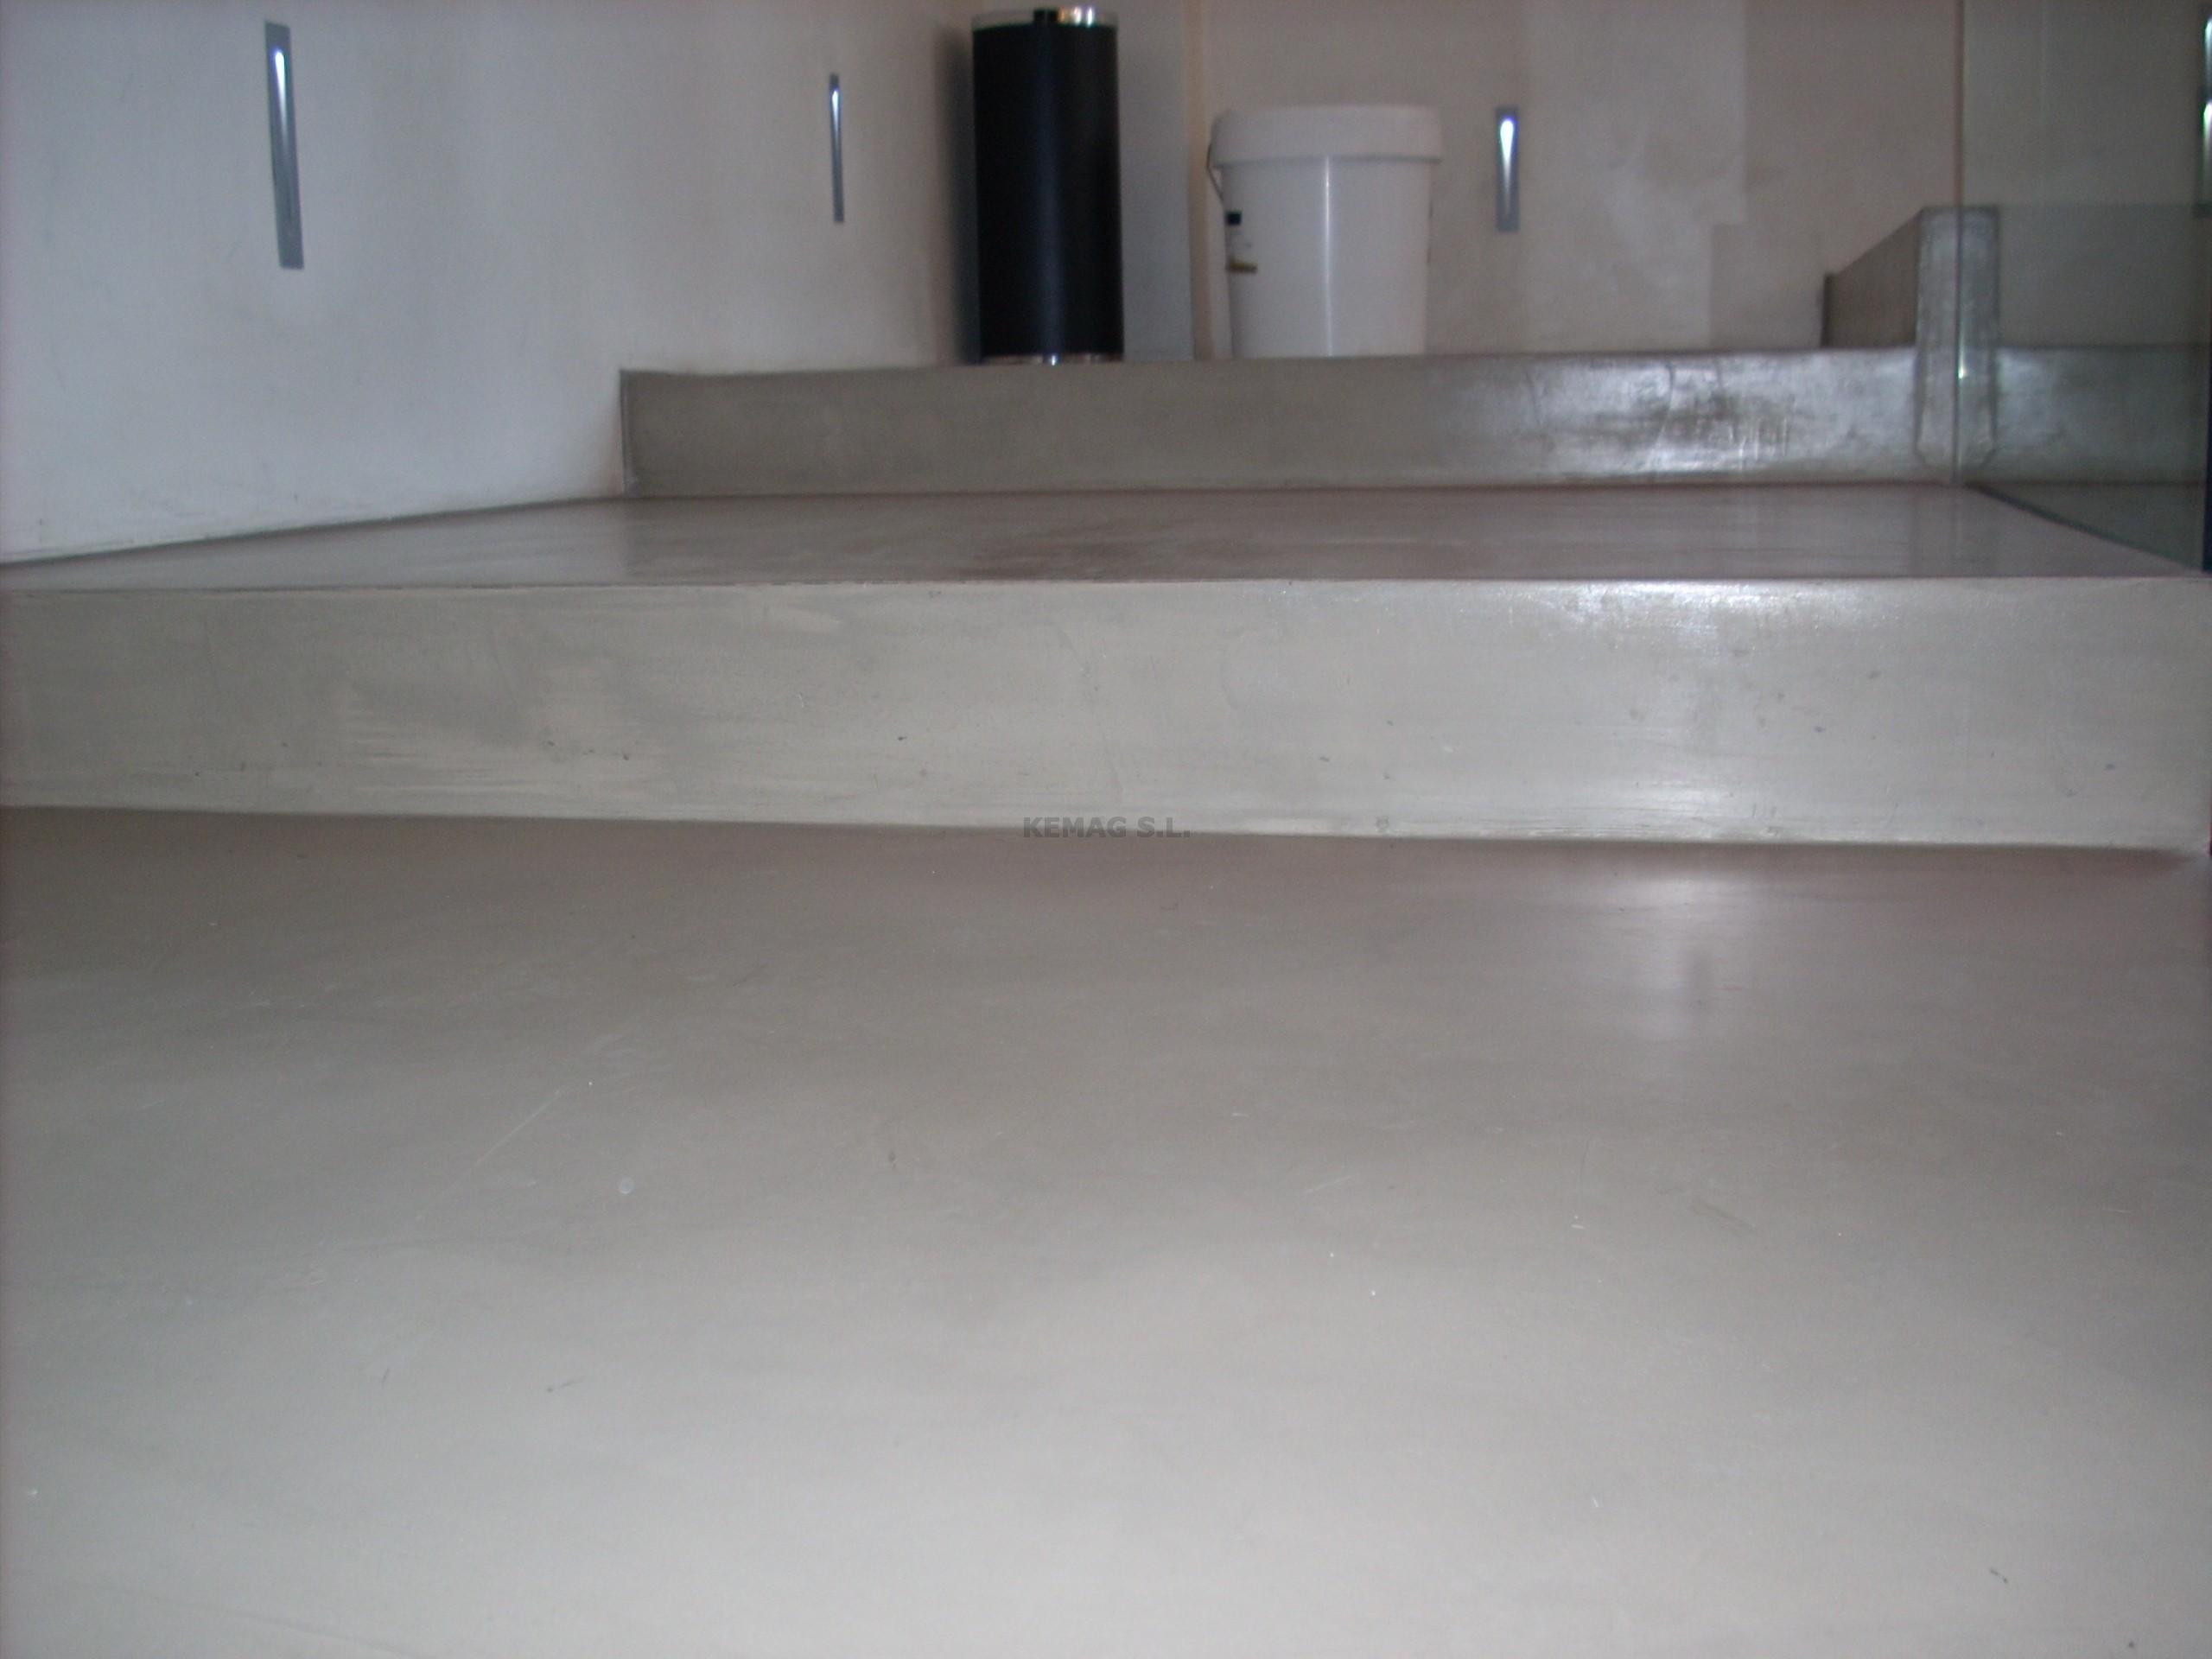 Preparar suelo para capa acabado de microcemento kemag pavimentos - Microcemento para suelos ...